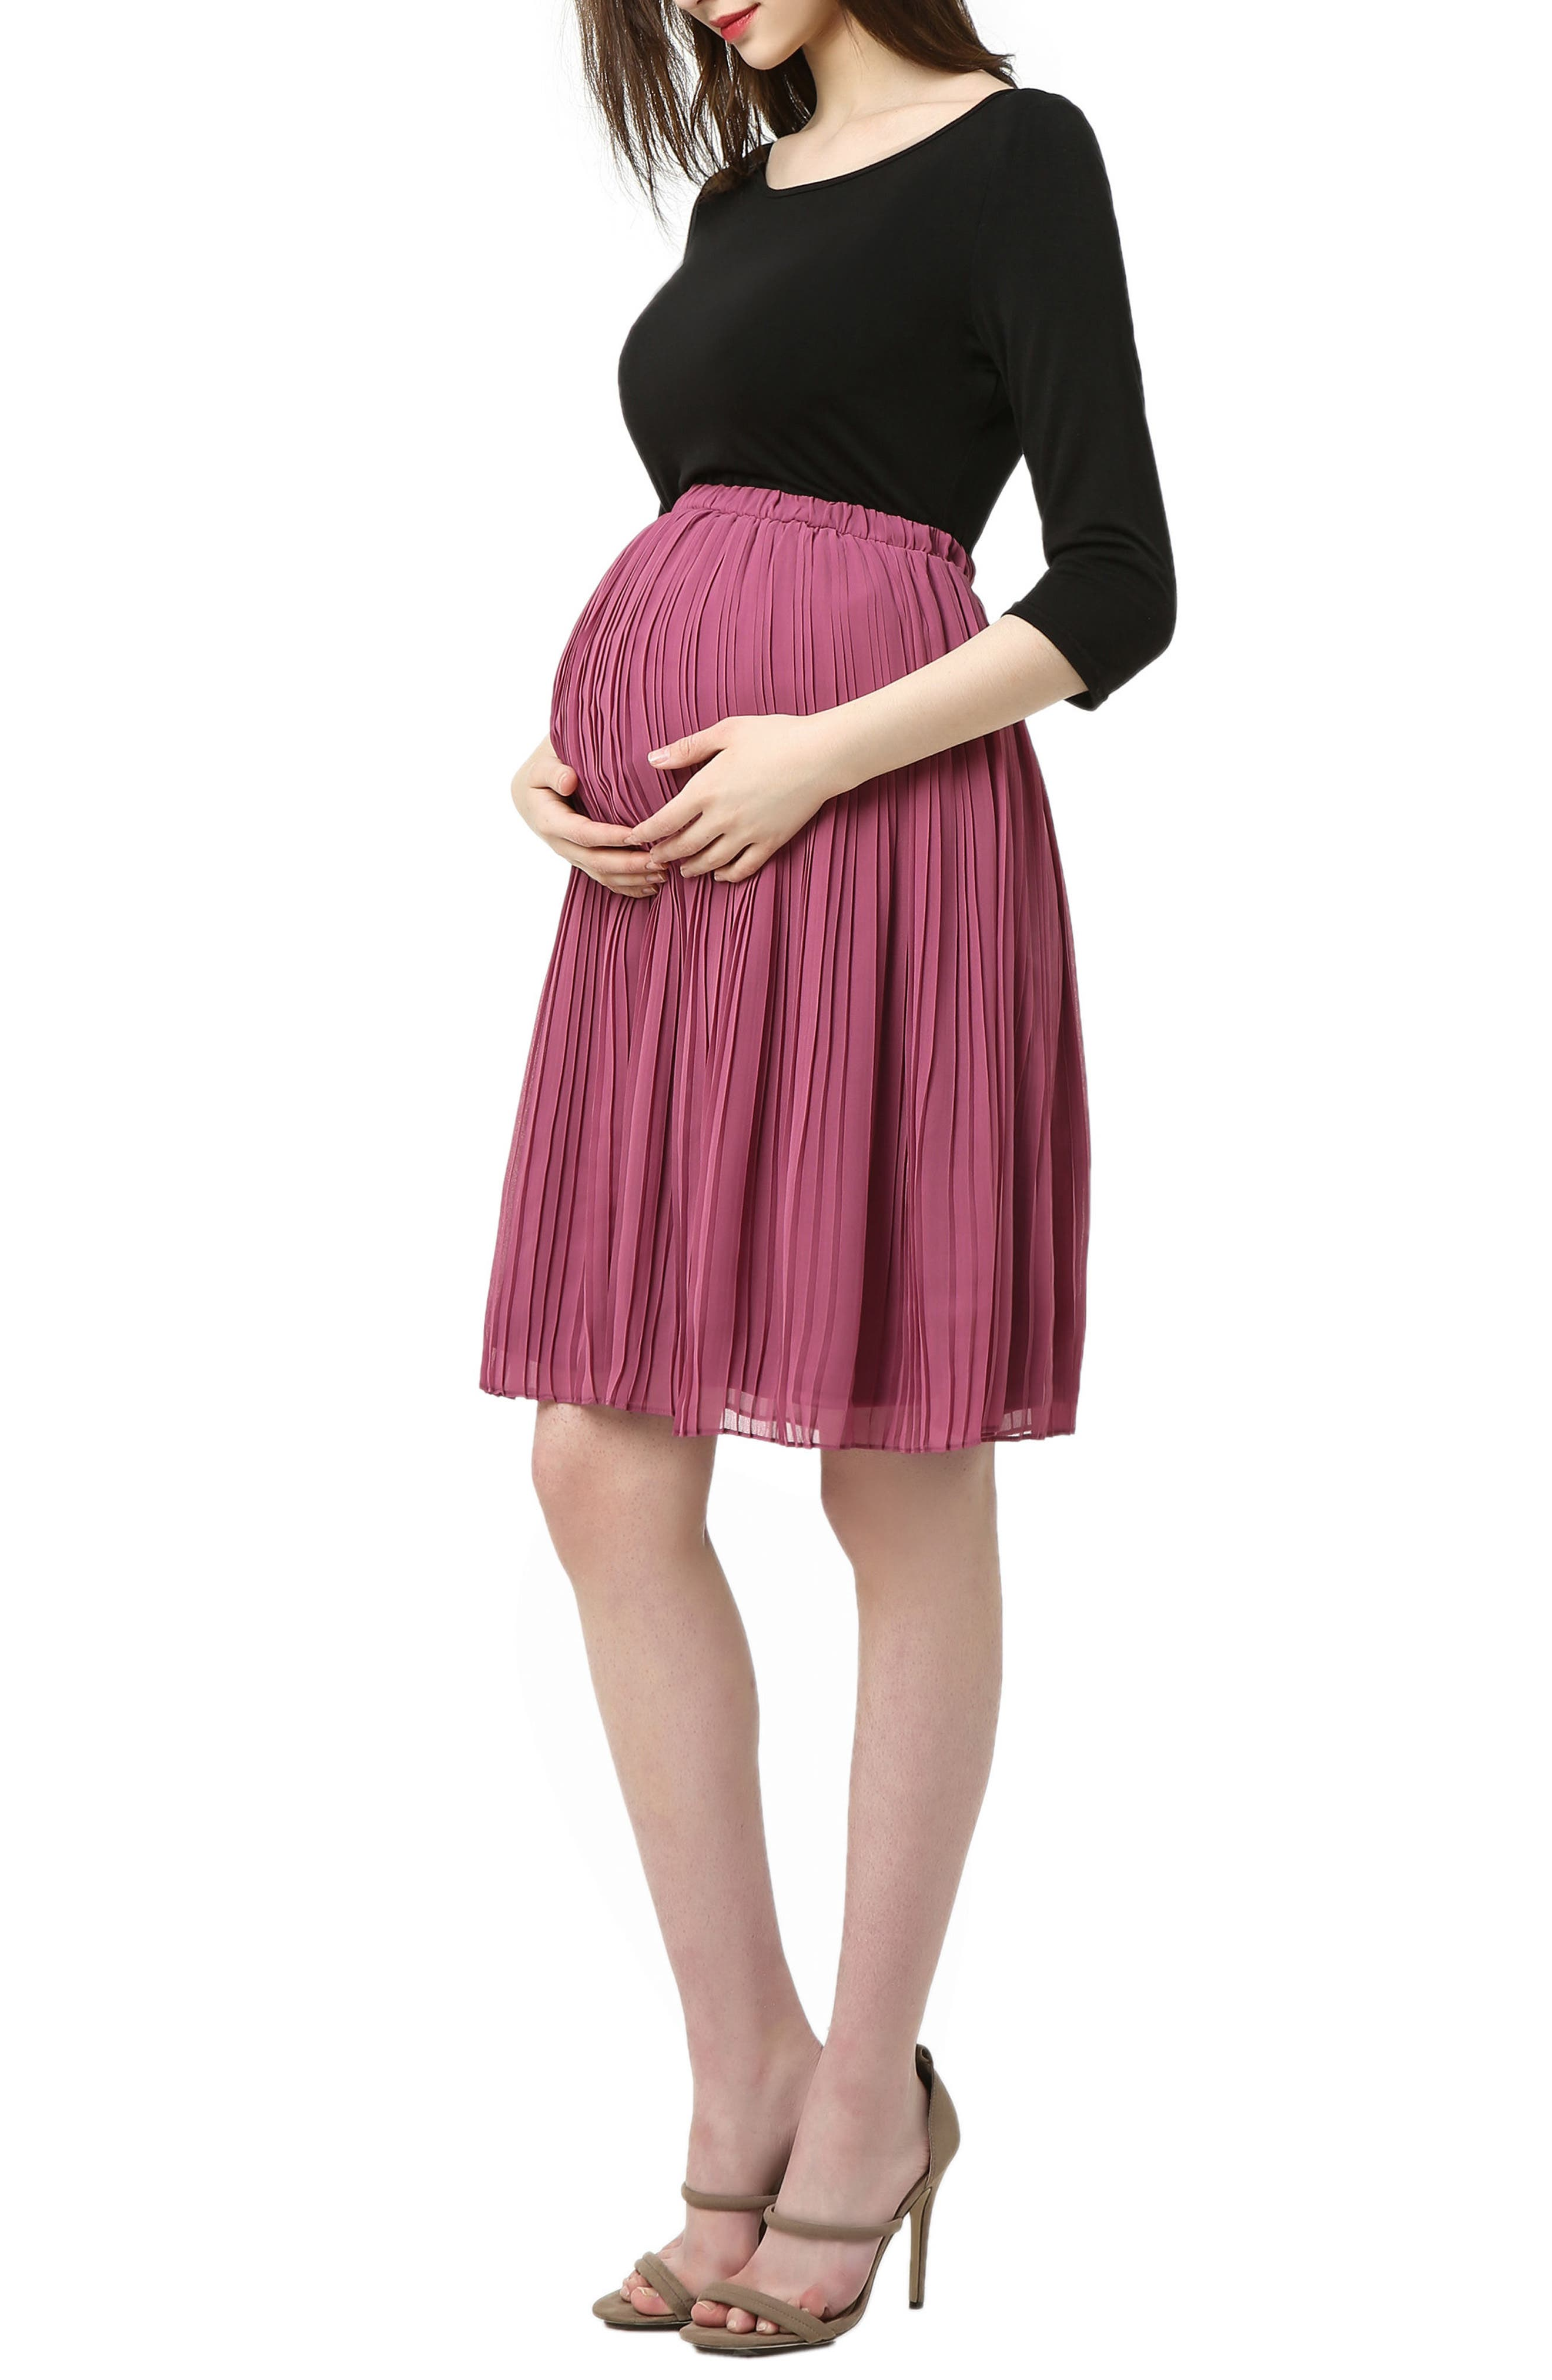 Marie Colorblock Pleat Skirt Maternity Dress,                             Alternate thumbnail 3, color,                             Black